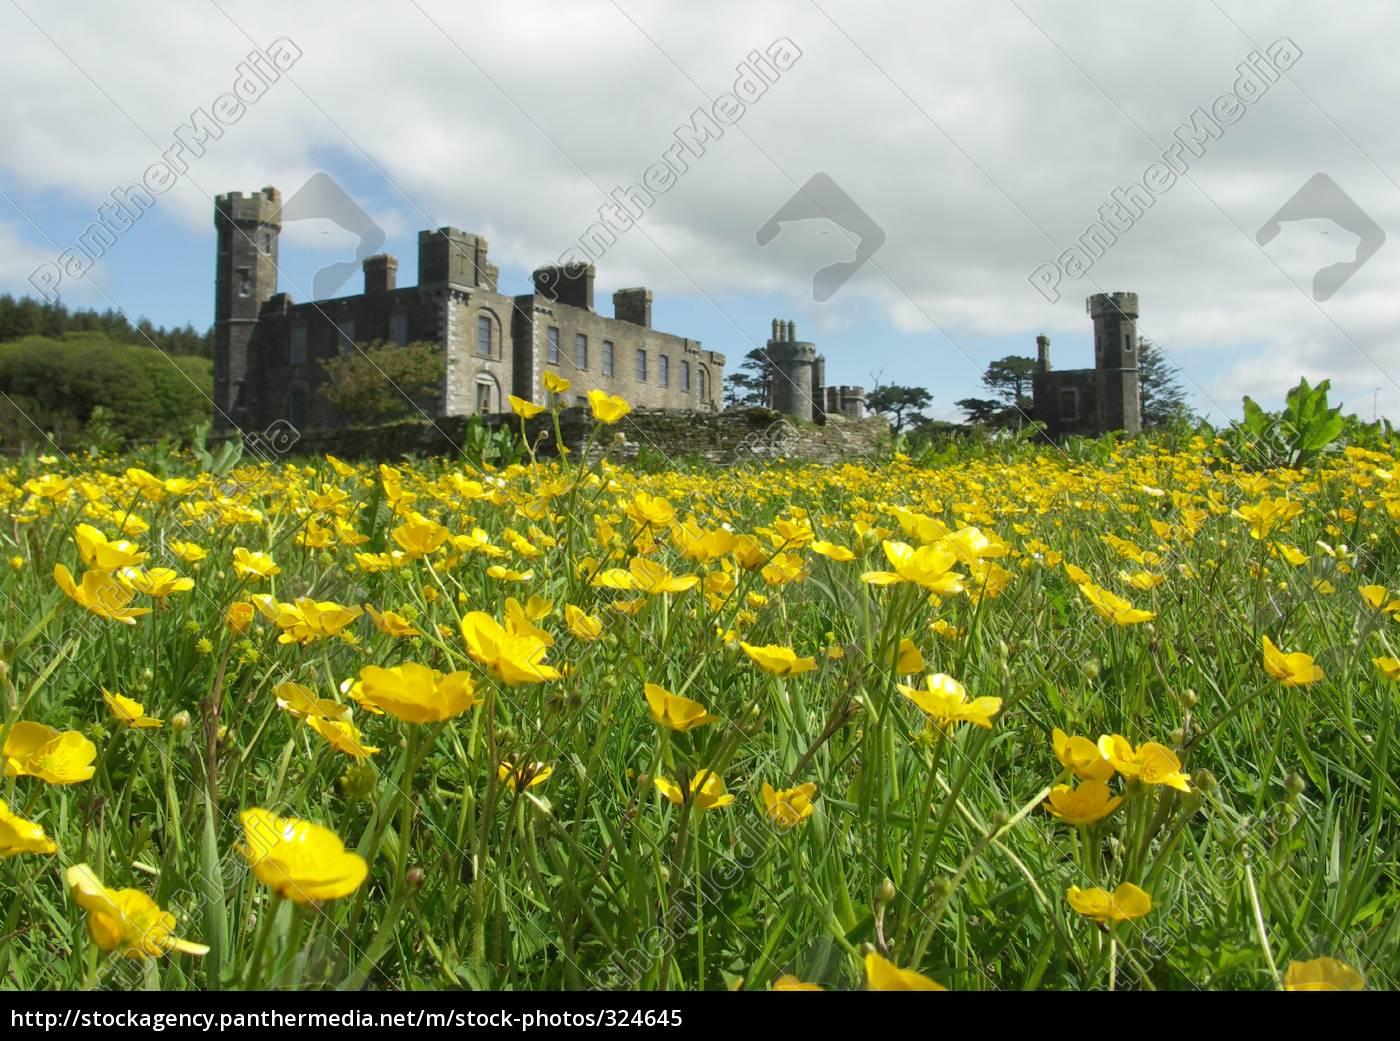 castletown-hall., 2 - 324645